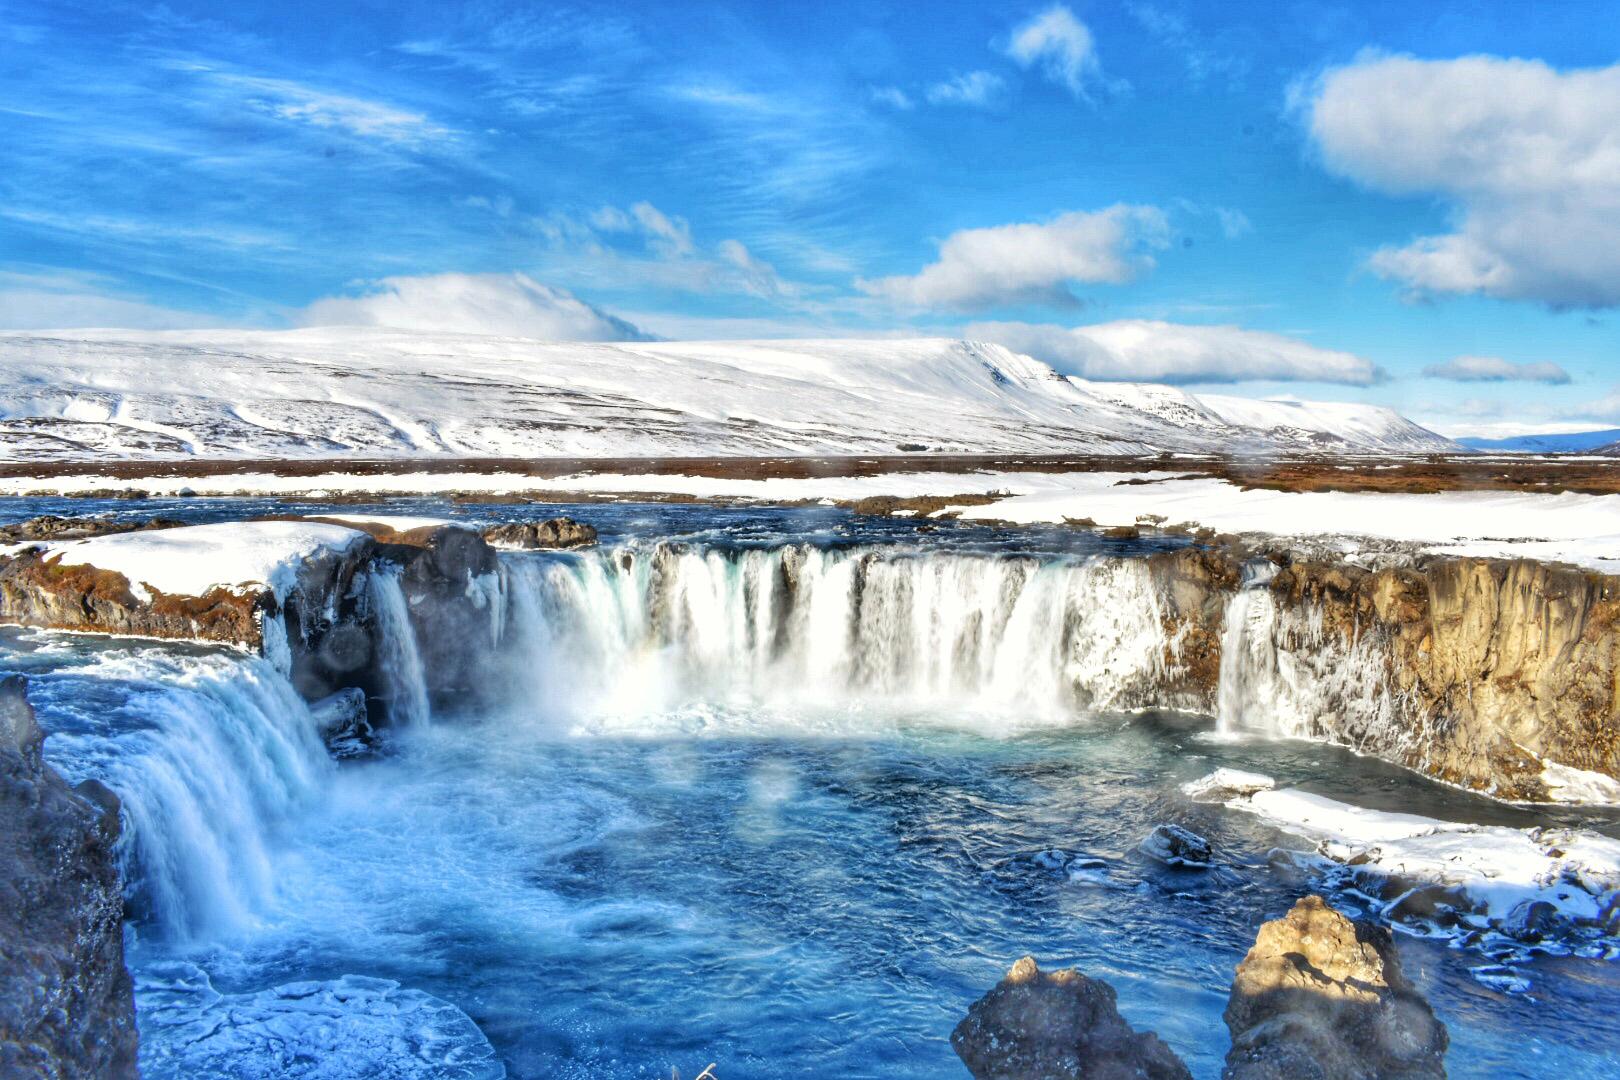 Icelandic Falls